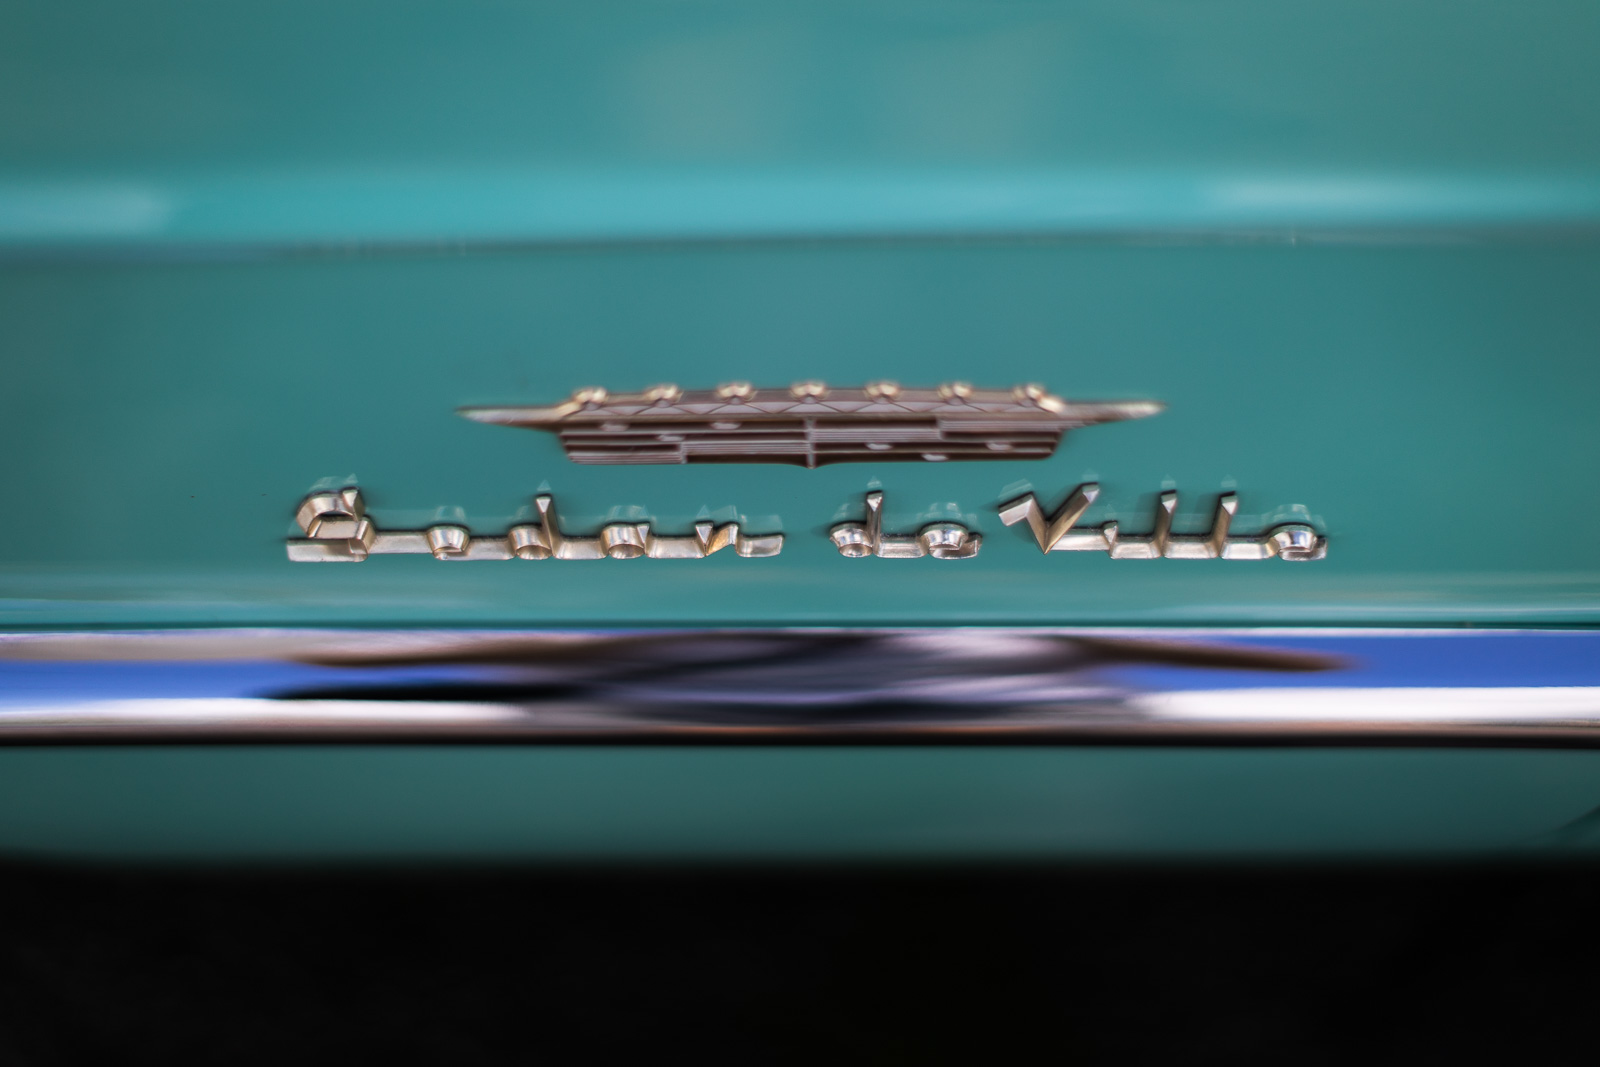 fat-guys-car-show-blog-13.jpg